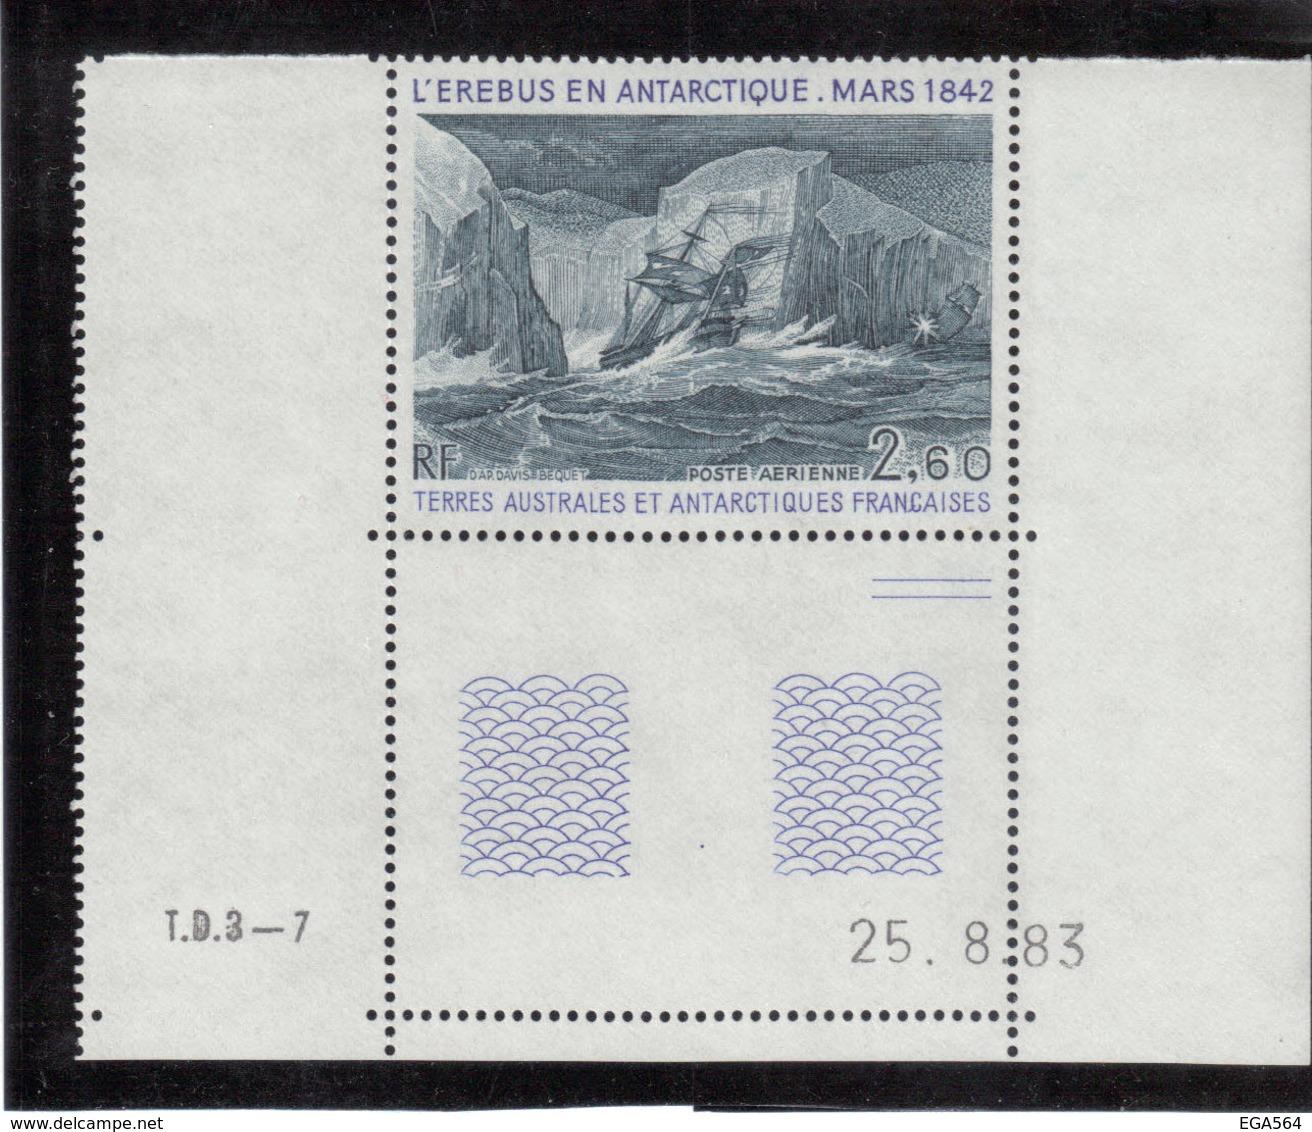 B5 - TAAF PA79** MNH De 1984 - L' EUREBUS EN ANTARCTIQUE.MARS 1842. Grand Coin De Feuille Daté. - Terres Australes Et Antarctiques Françaises (TAAF)